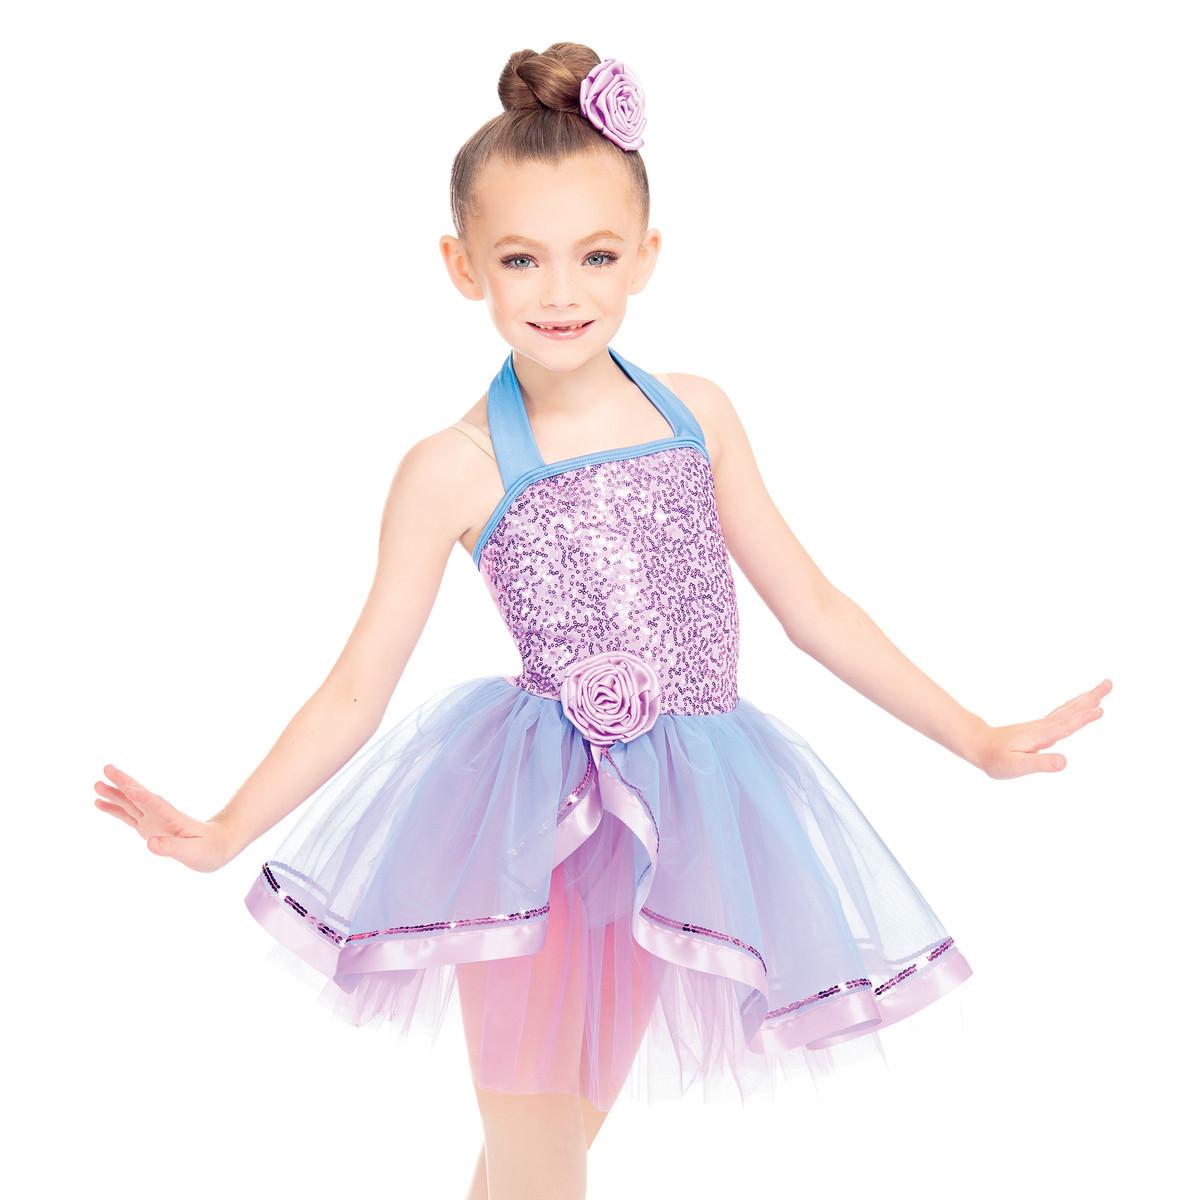 Tiny Tots Ballet